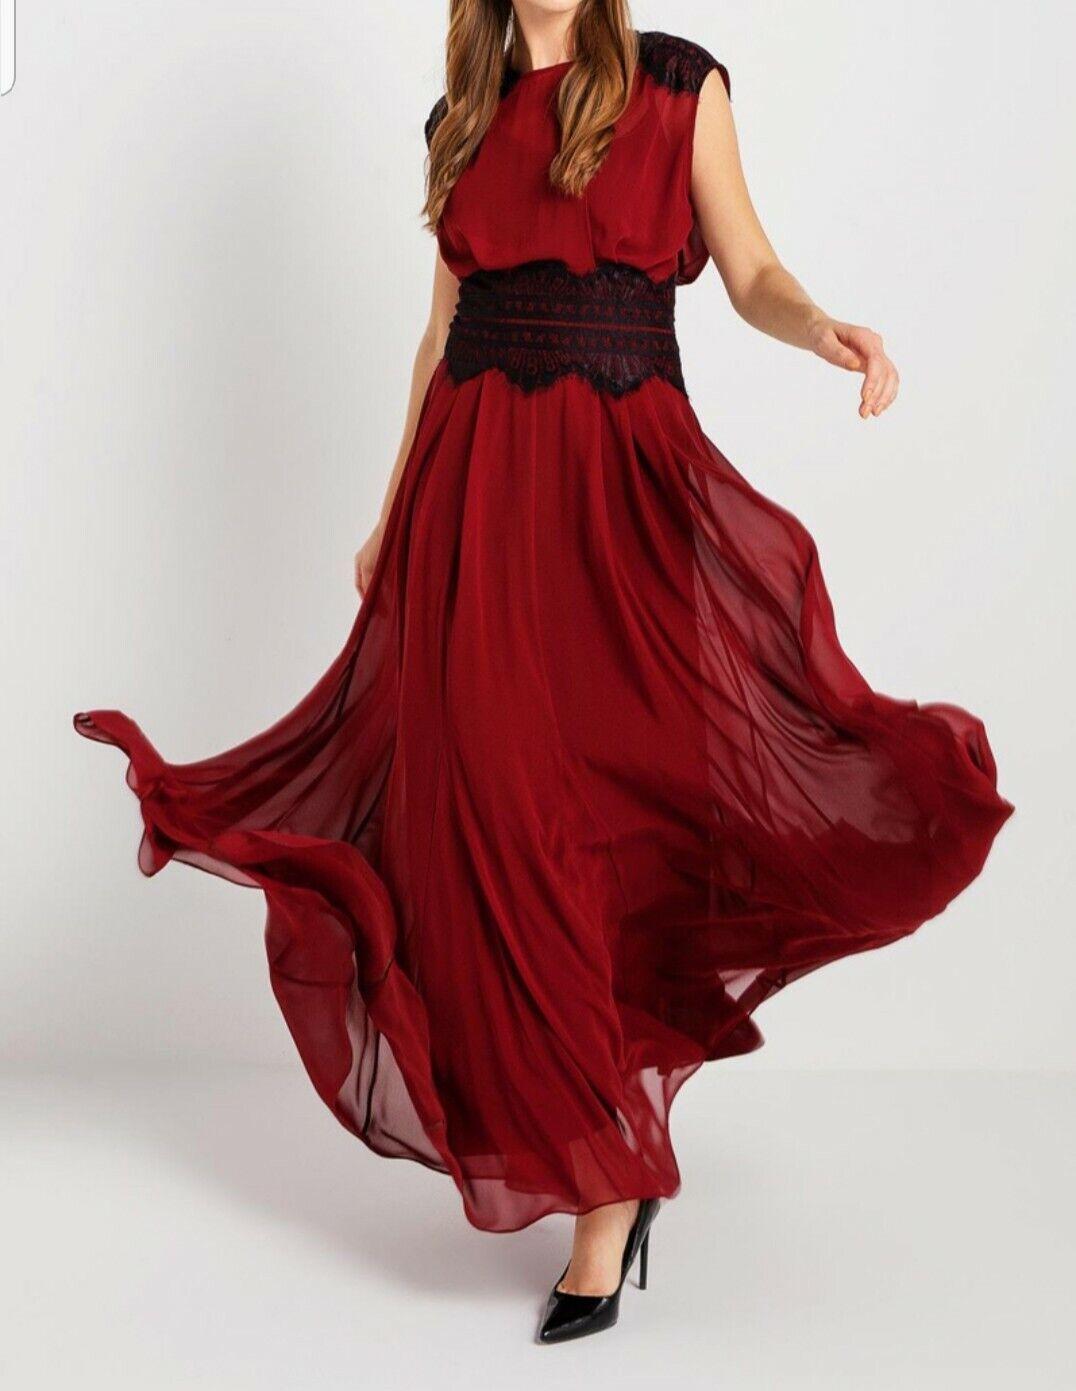 NEW  BGN Abito Vestito Cerimonia matrimonio bordeaux  pizo schwarz Dress